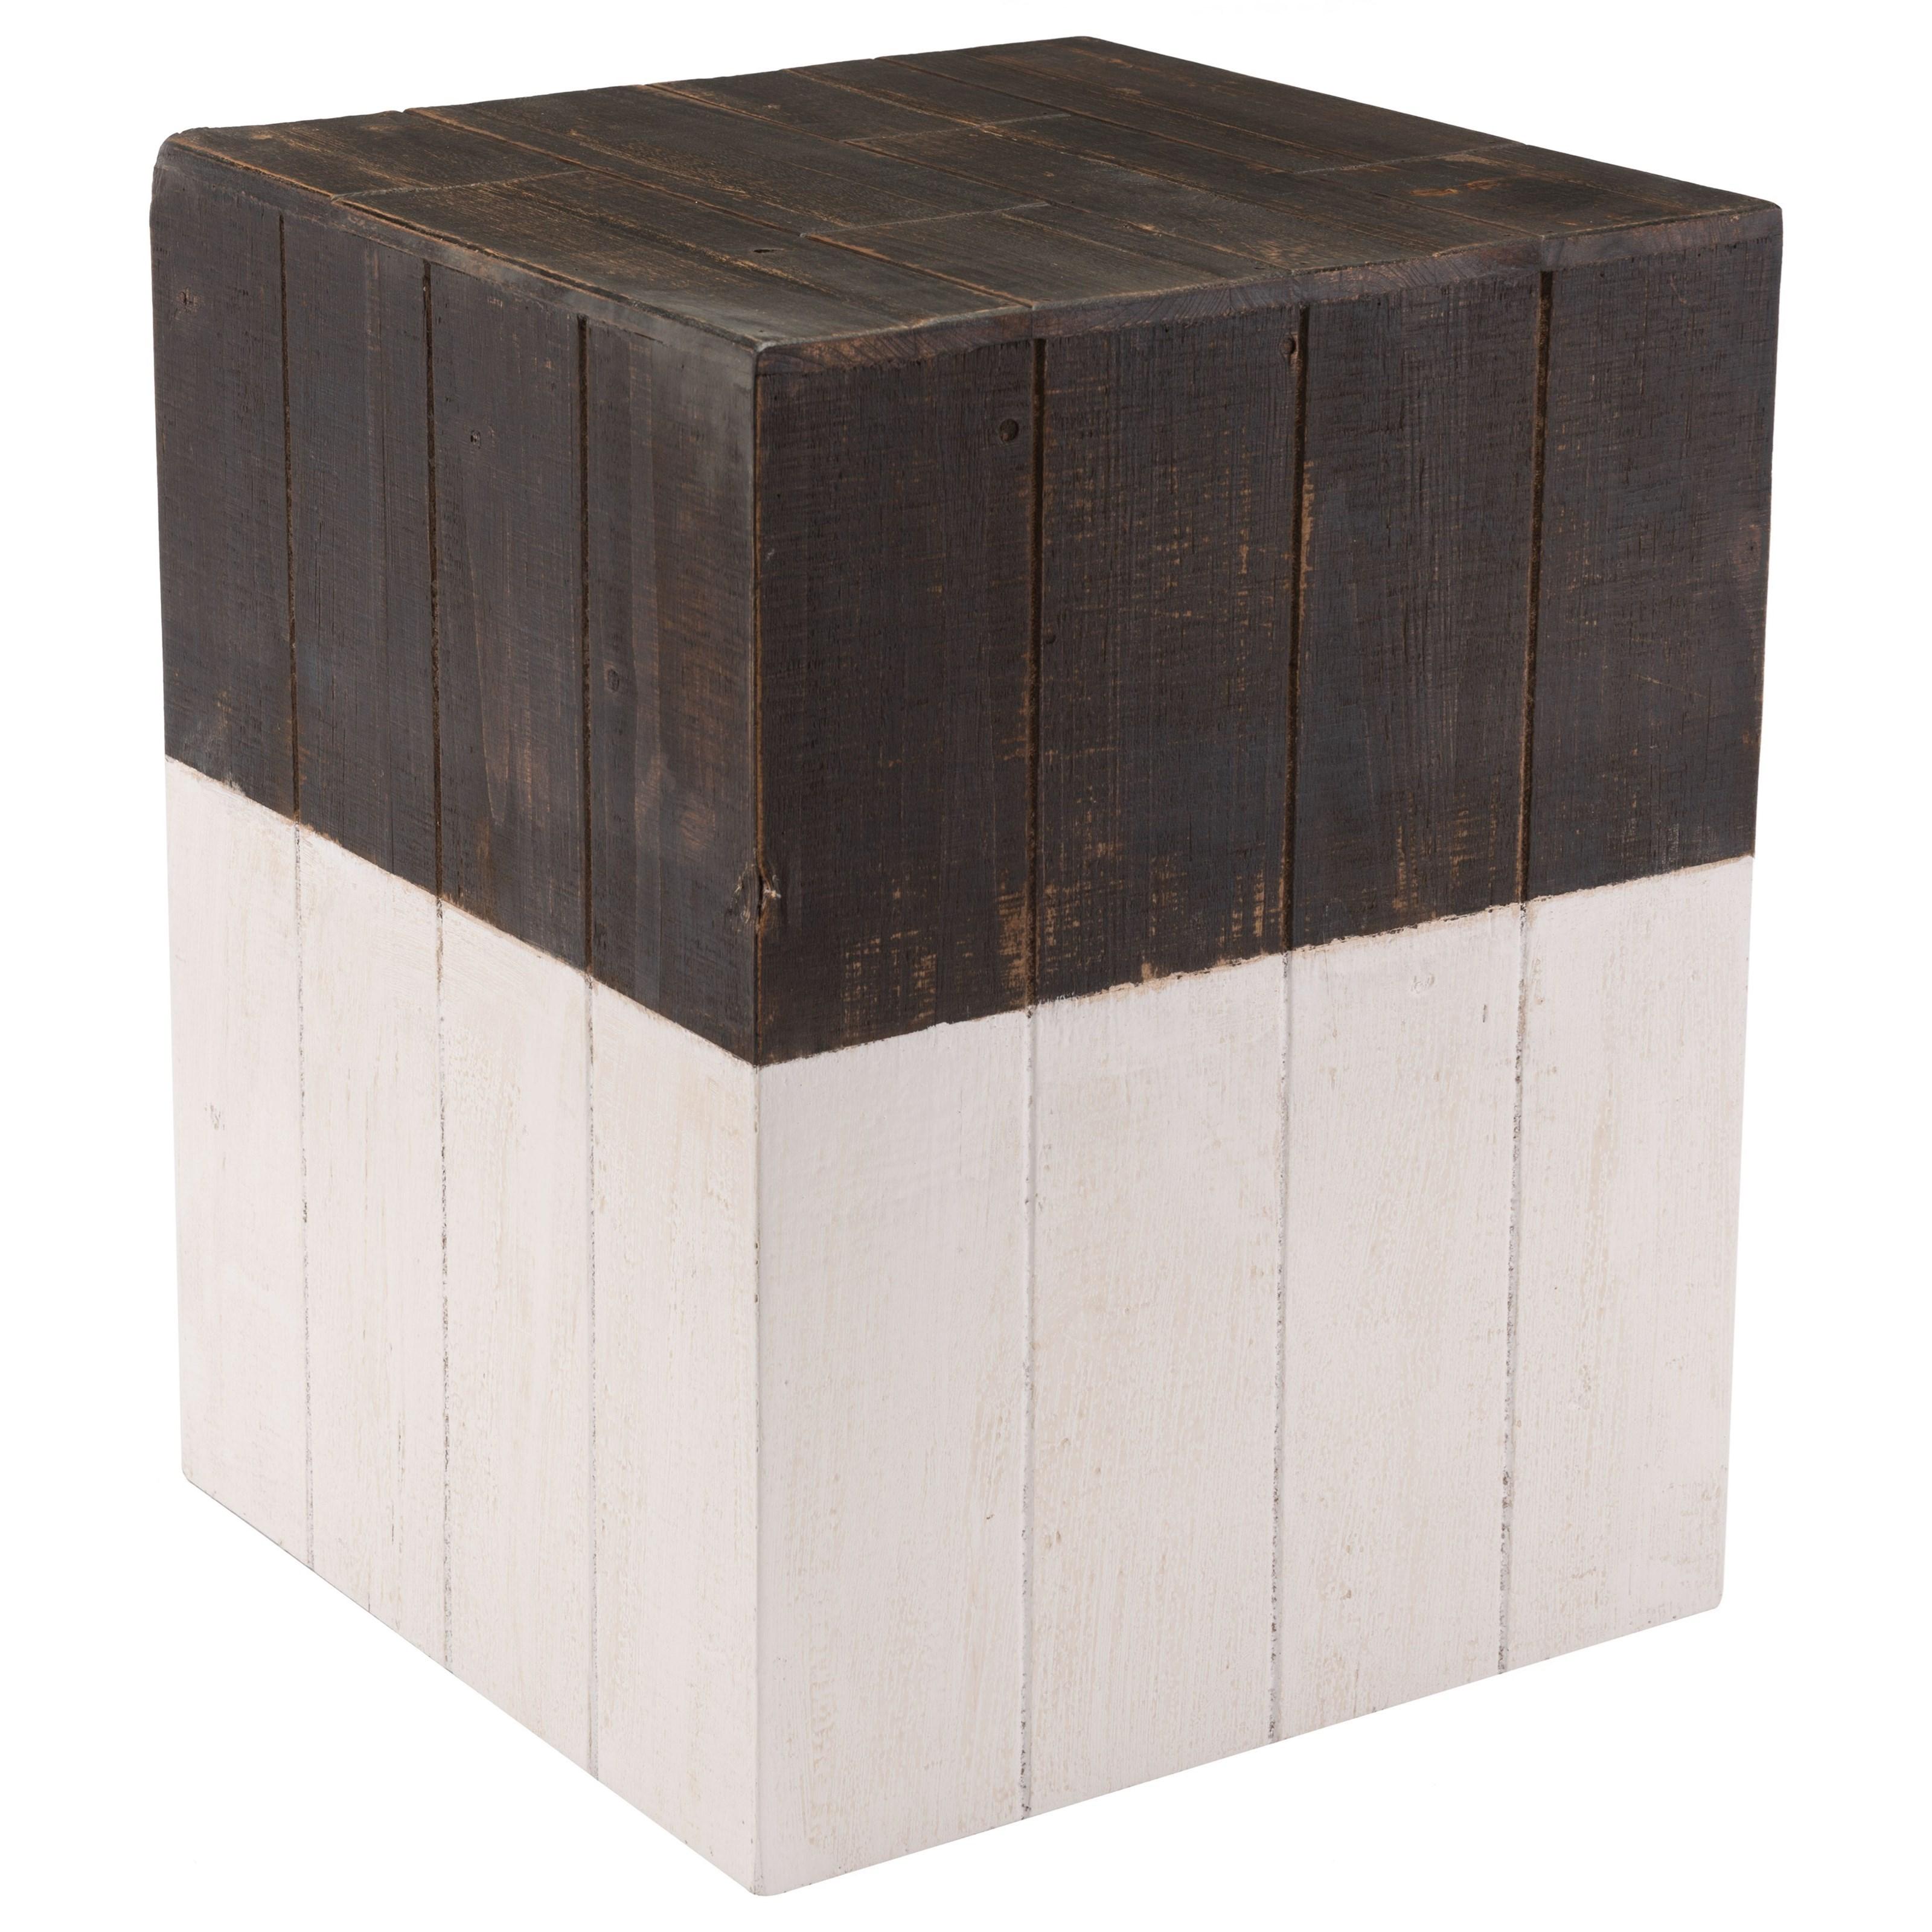 Wooden Square Garden Seat